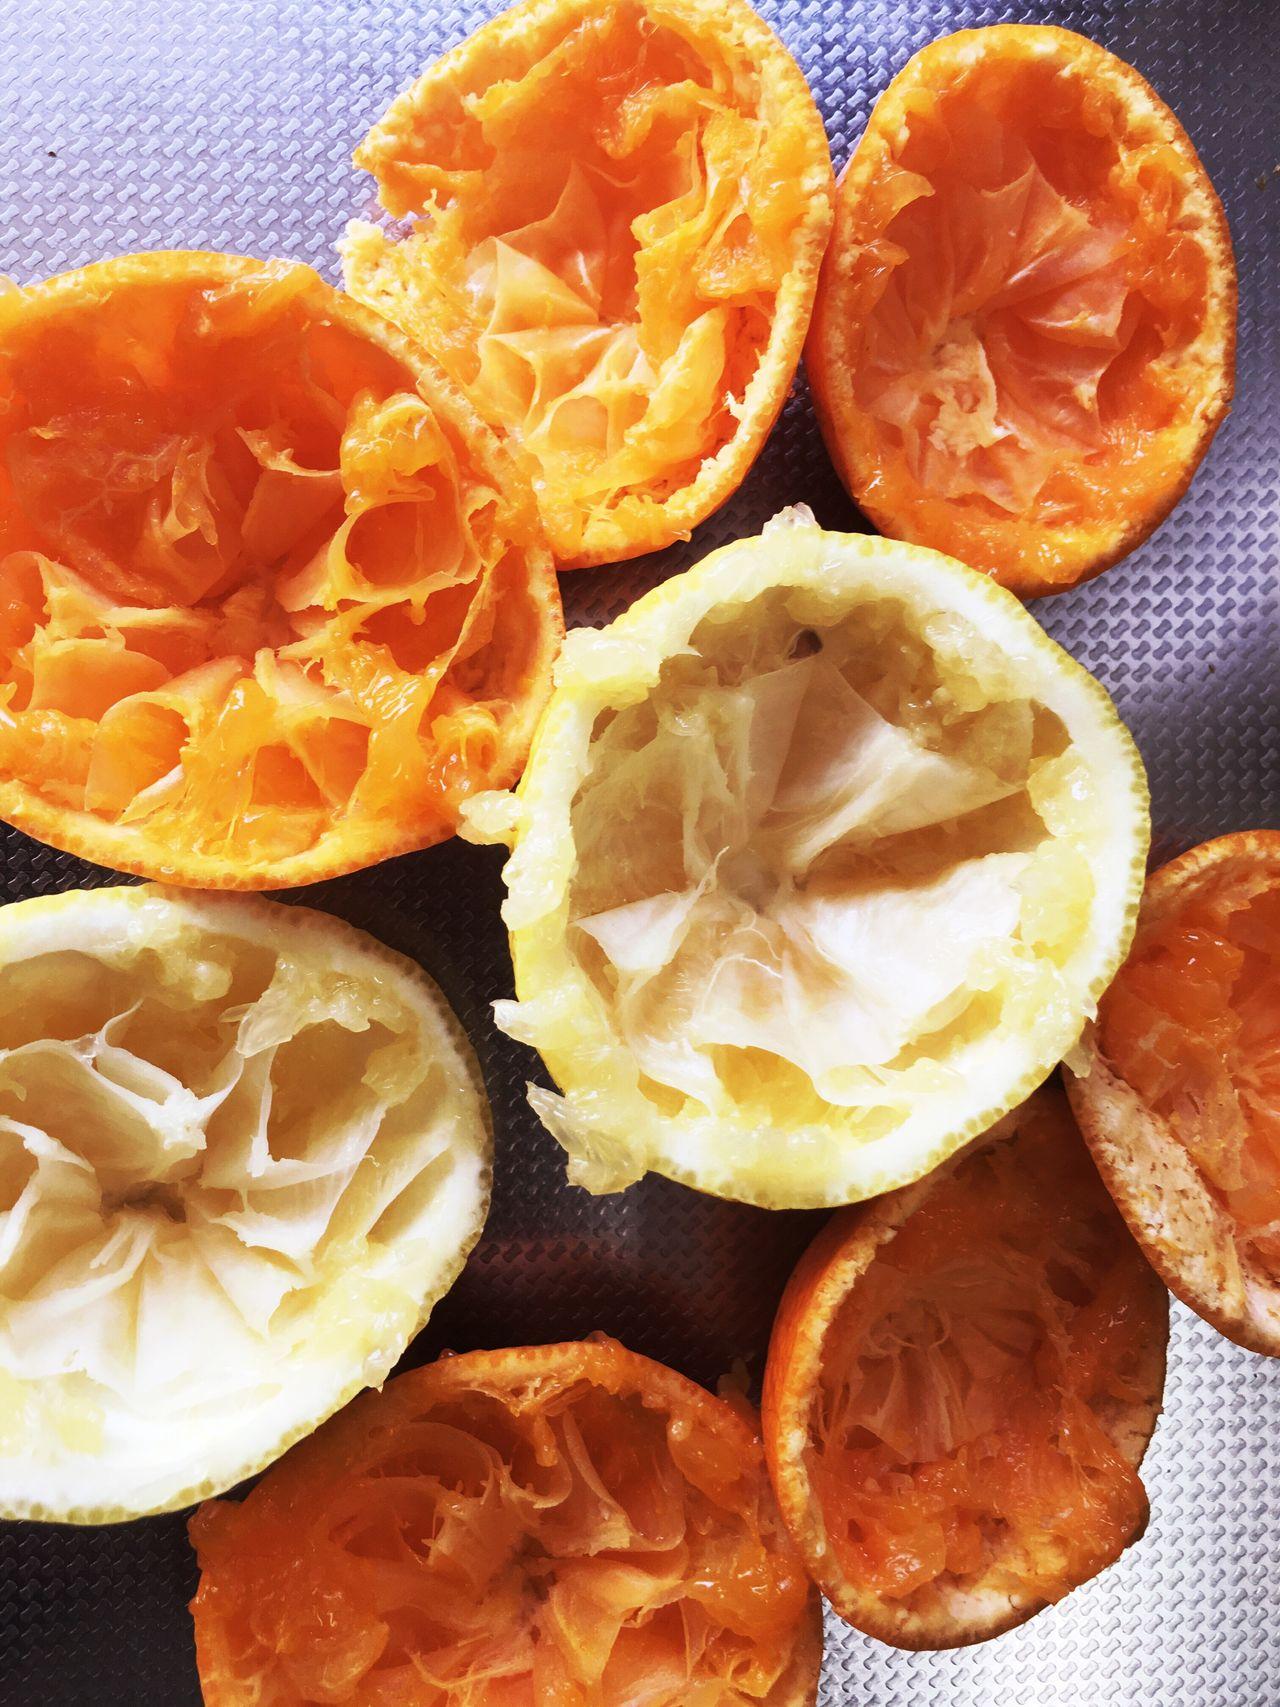 Freshness Food Orange Color Orange - Fruit Fruit